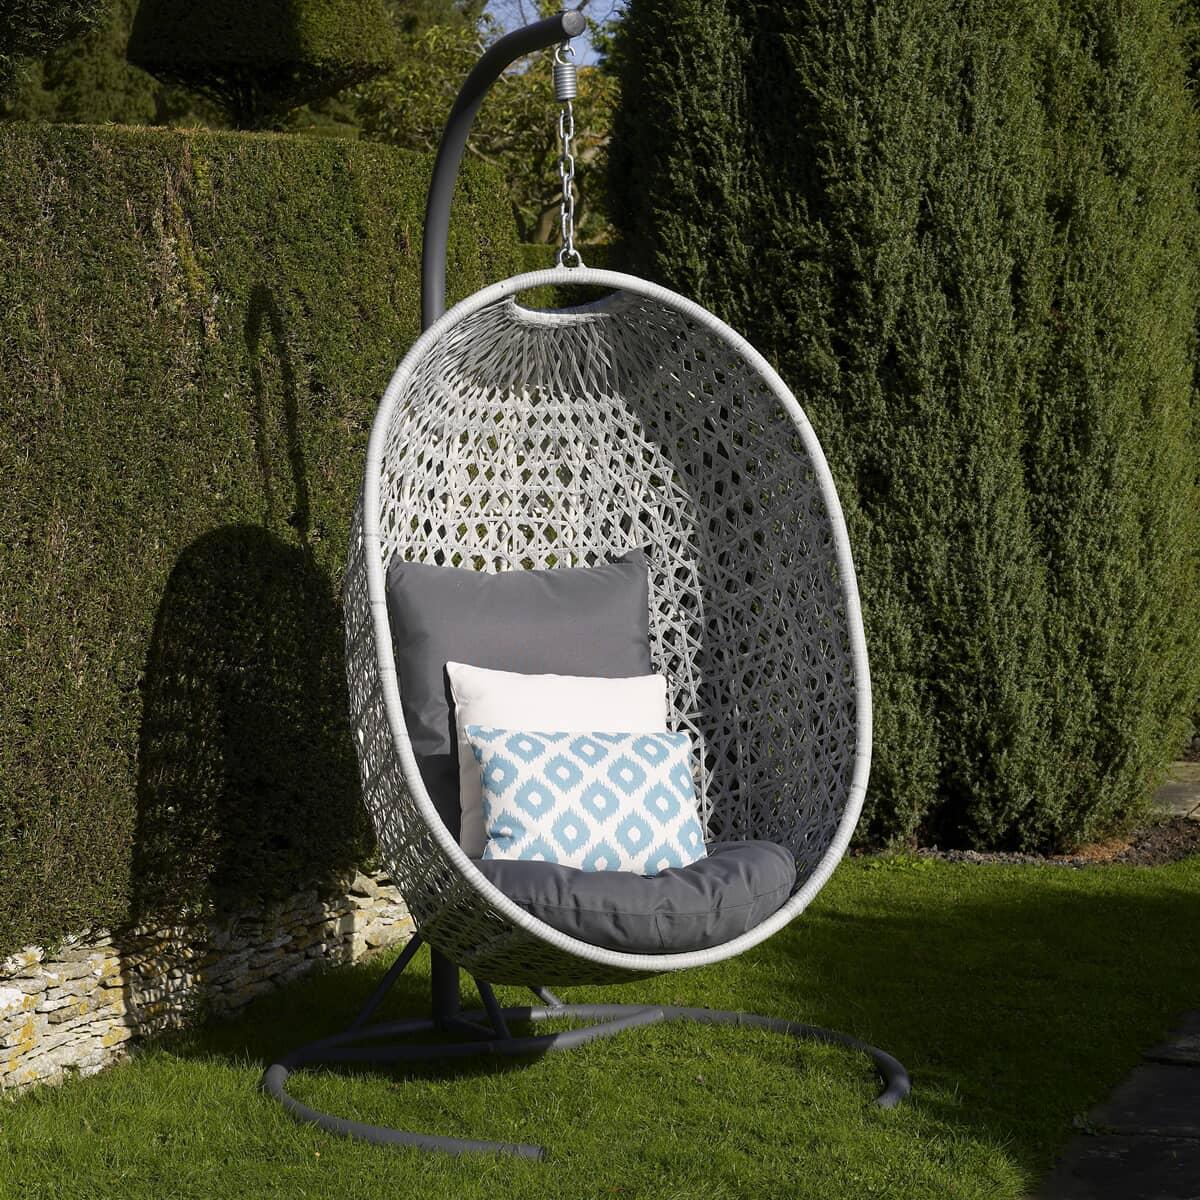 Bramblecrest Monterey Single Hanging Cocoon Including Season Proof New Charcoal Cushions Rmhc1c Garden Furniture World